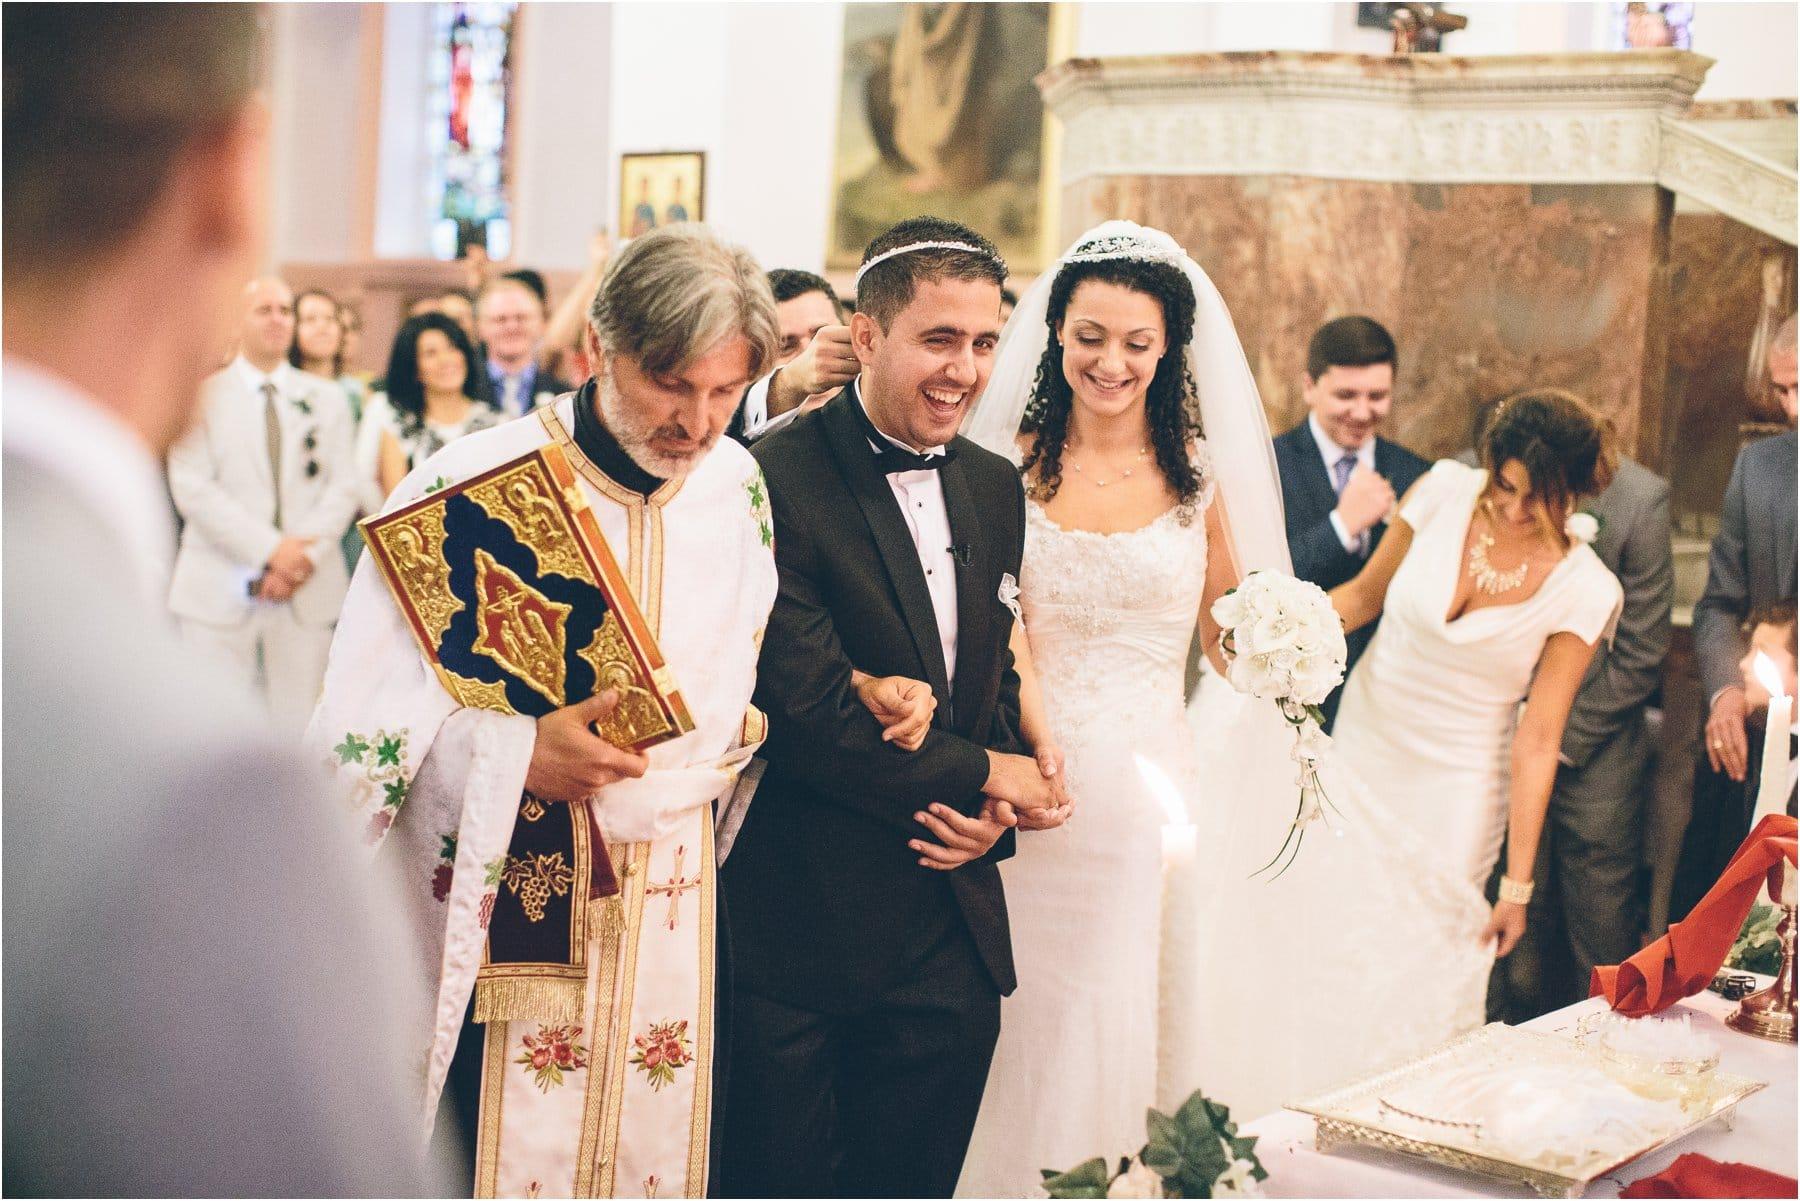 Midland_Manchester_Wedding_Photography_0070